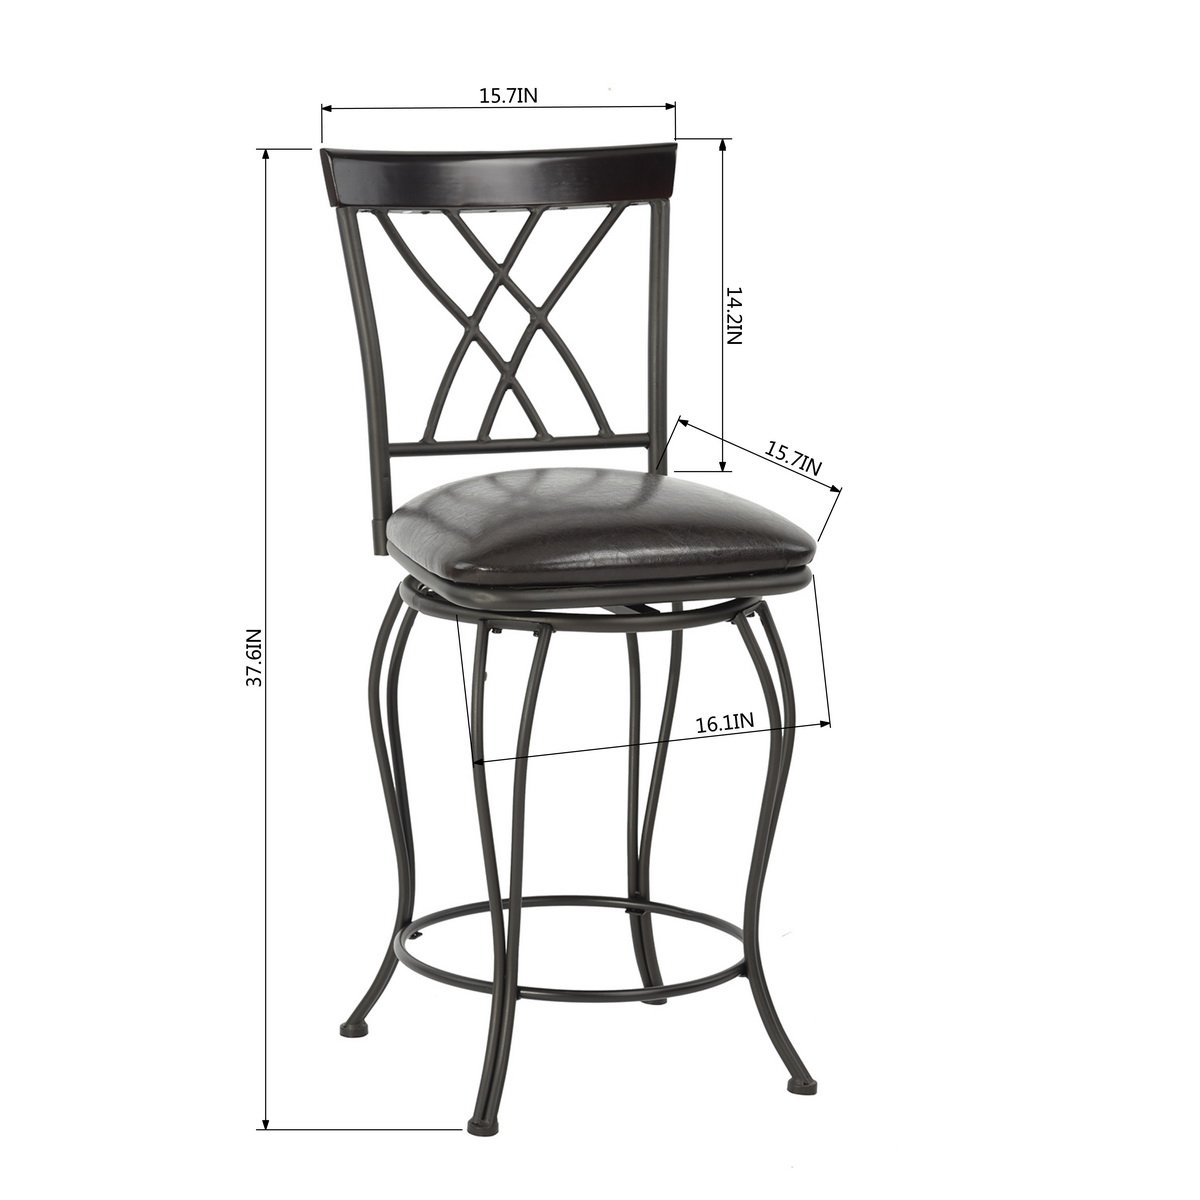 FurnitureR 24'' Circles-Back Swivel Bar stool Counter Height Bar Chair by FurnitureR (Image #9)